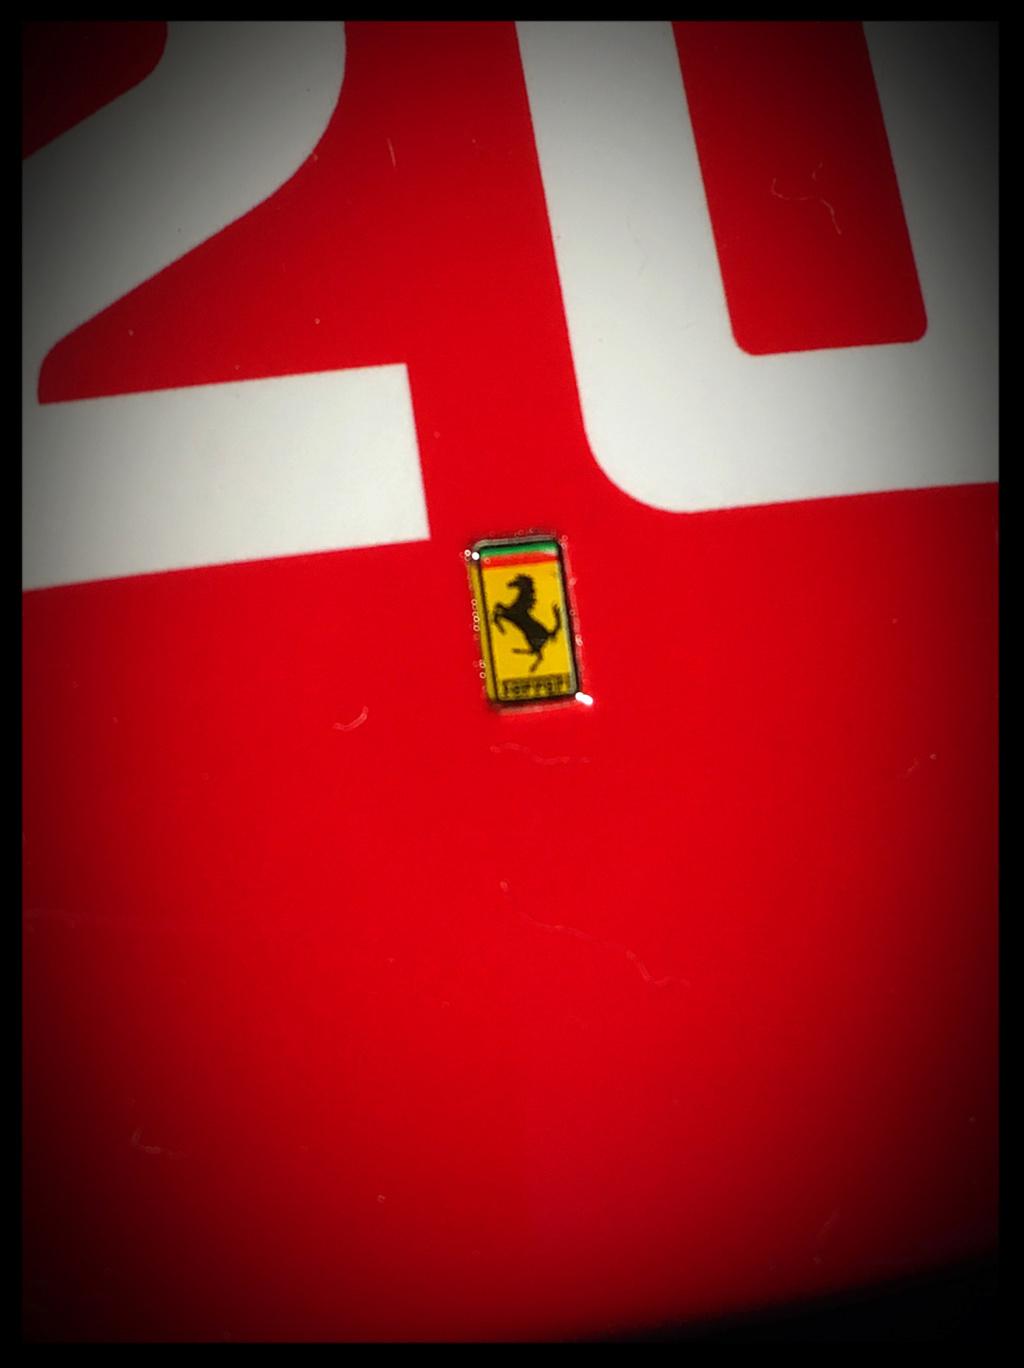 1/12 MFH Ferrari 312F1, Chris Amon, Monaco 1967 - Page 4 Ndsf3610